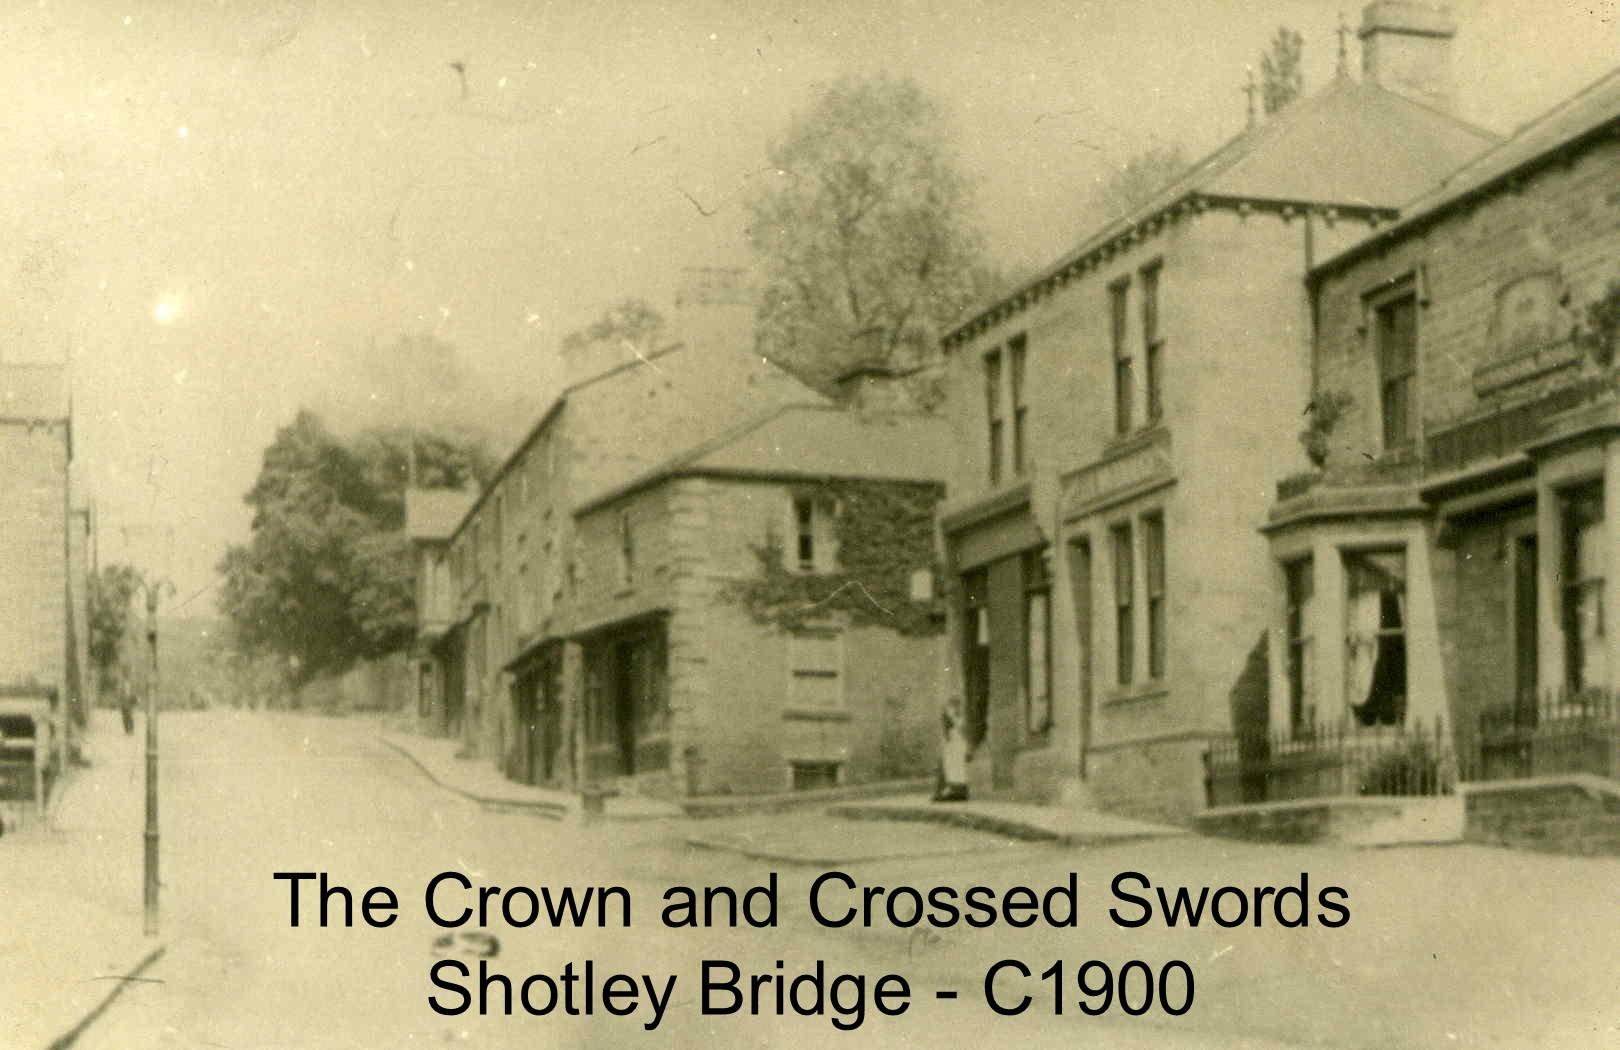 the lasting heratige of the sword makers in Shotley Bridge